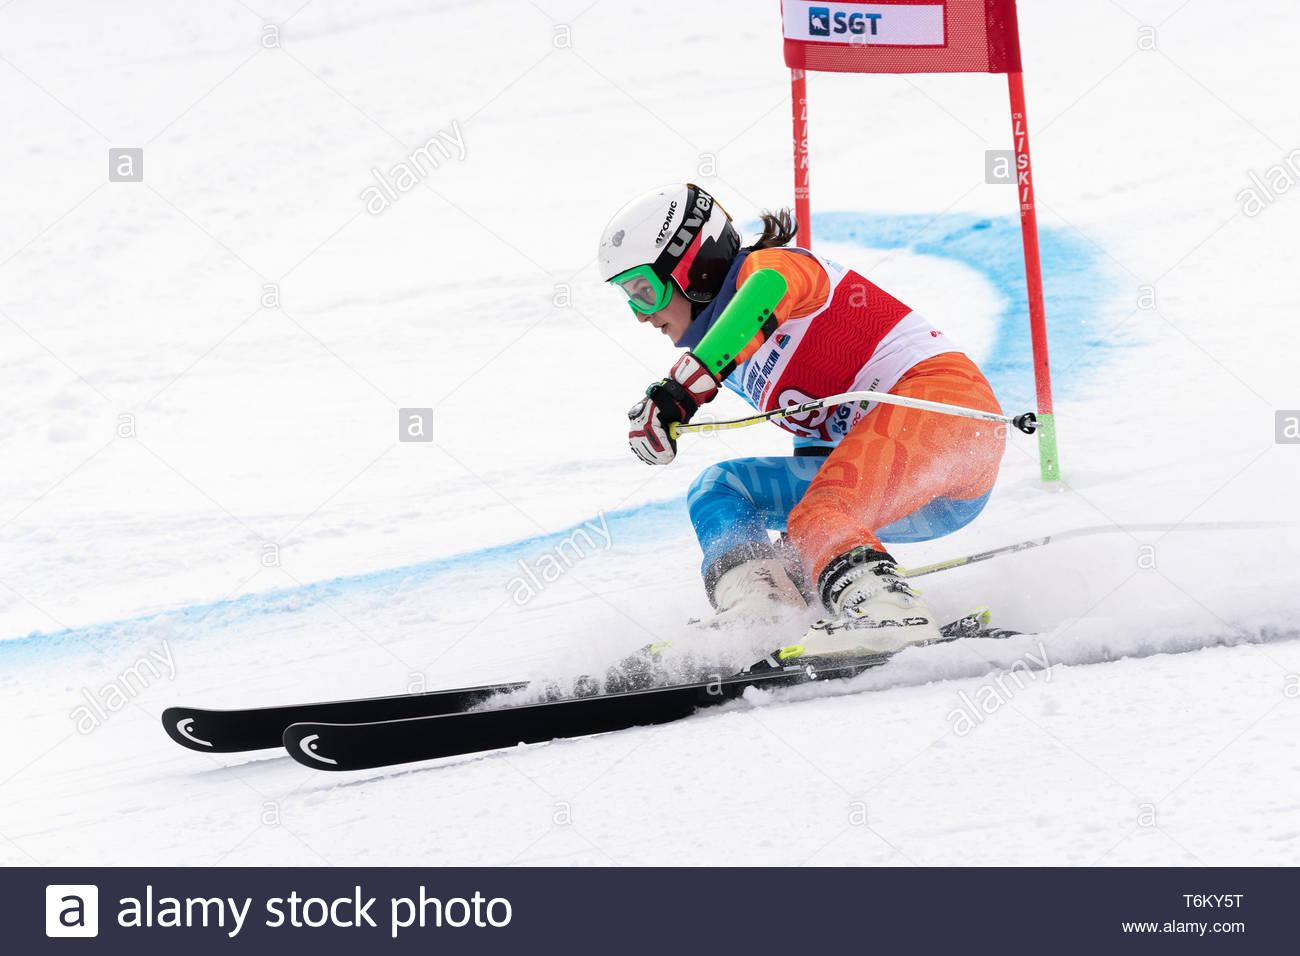 KAMCHATKA PENINSULA, RUSSIA - APR 2, 2019: Mountain skier Fugleva Victoria (Sakhalin Region) skiing down mount. Russian Women's Alpine Skiing Cup Inte - Stock Image